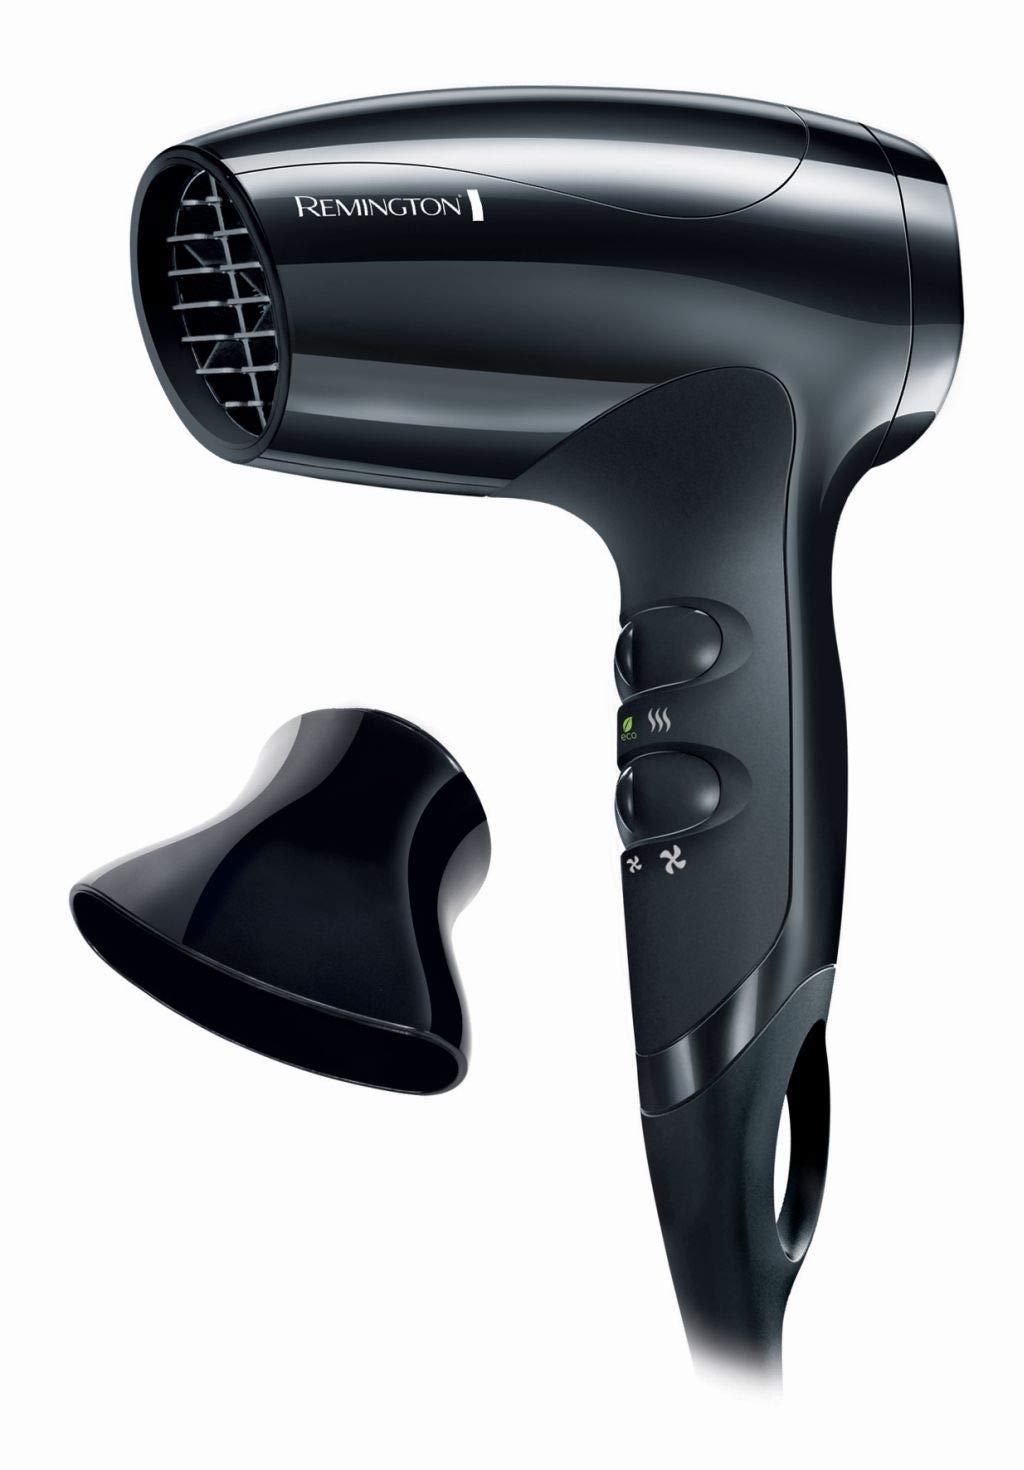 Remington D5000 Hair Dryer